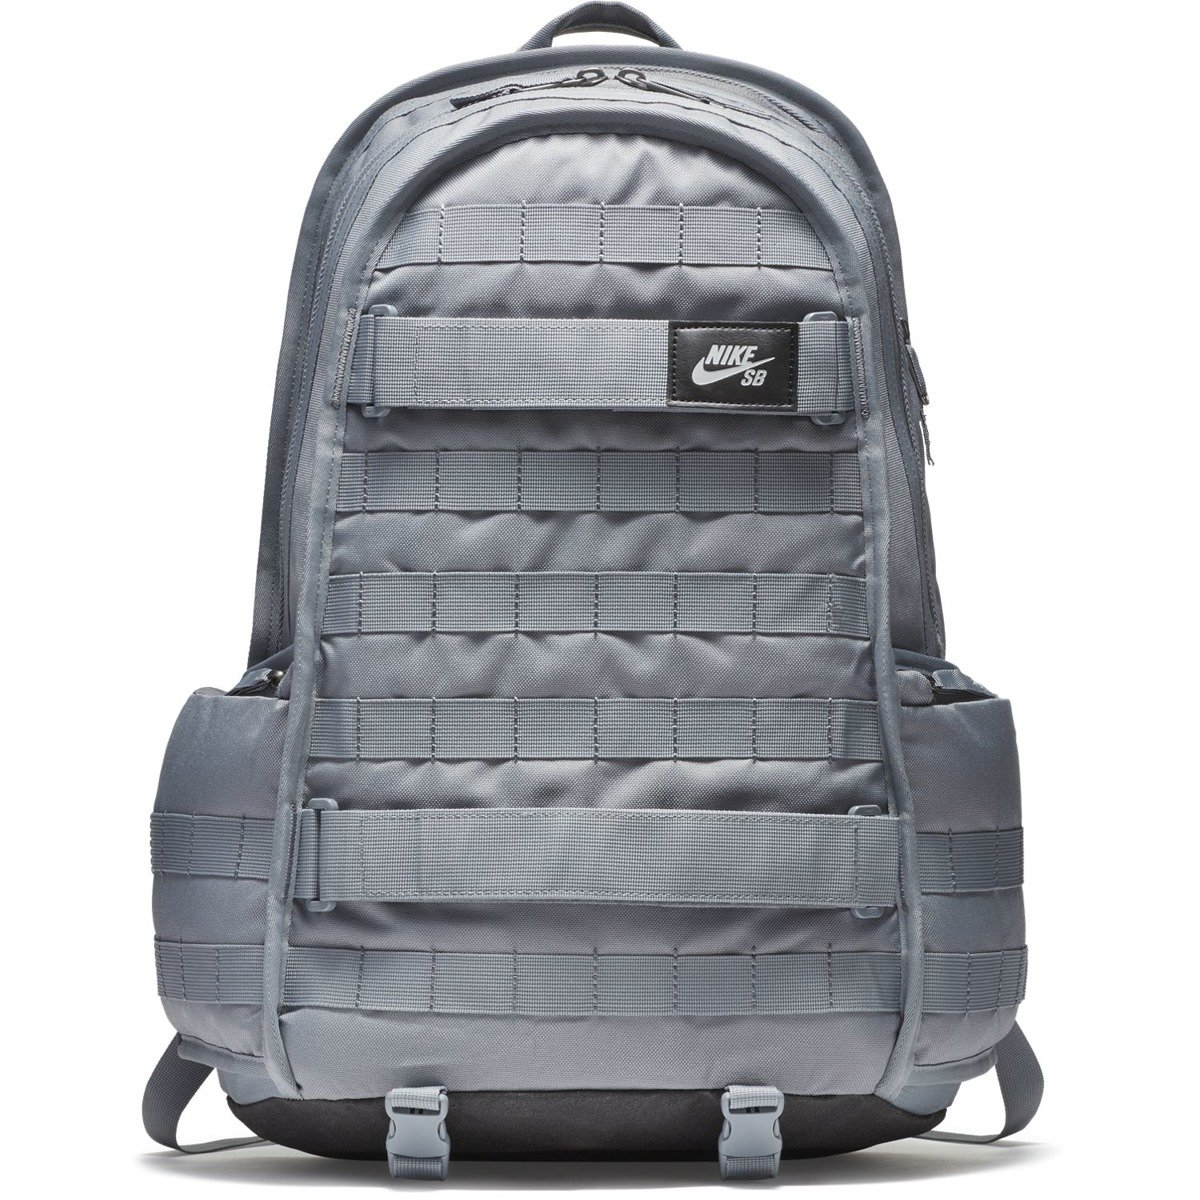 16d446f00436b Miniramp Skateshop plecak nk sb prm bkpk solid